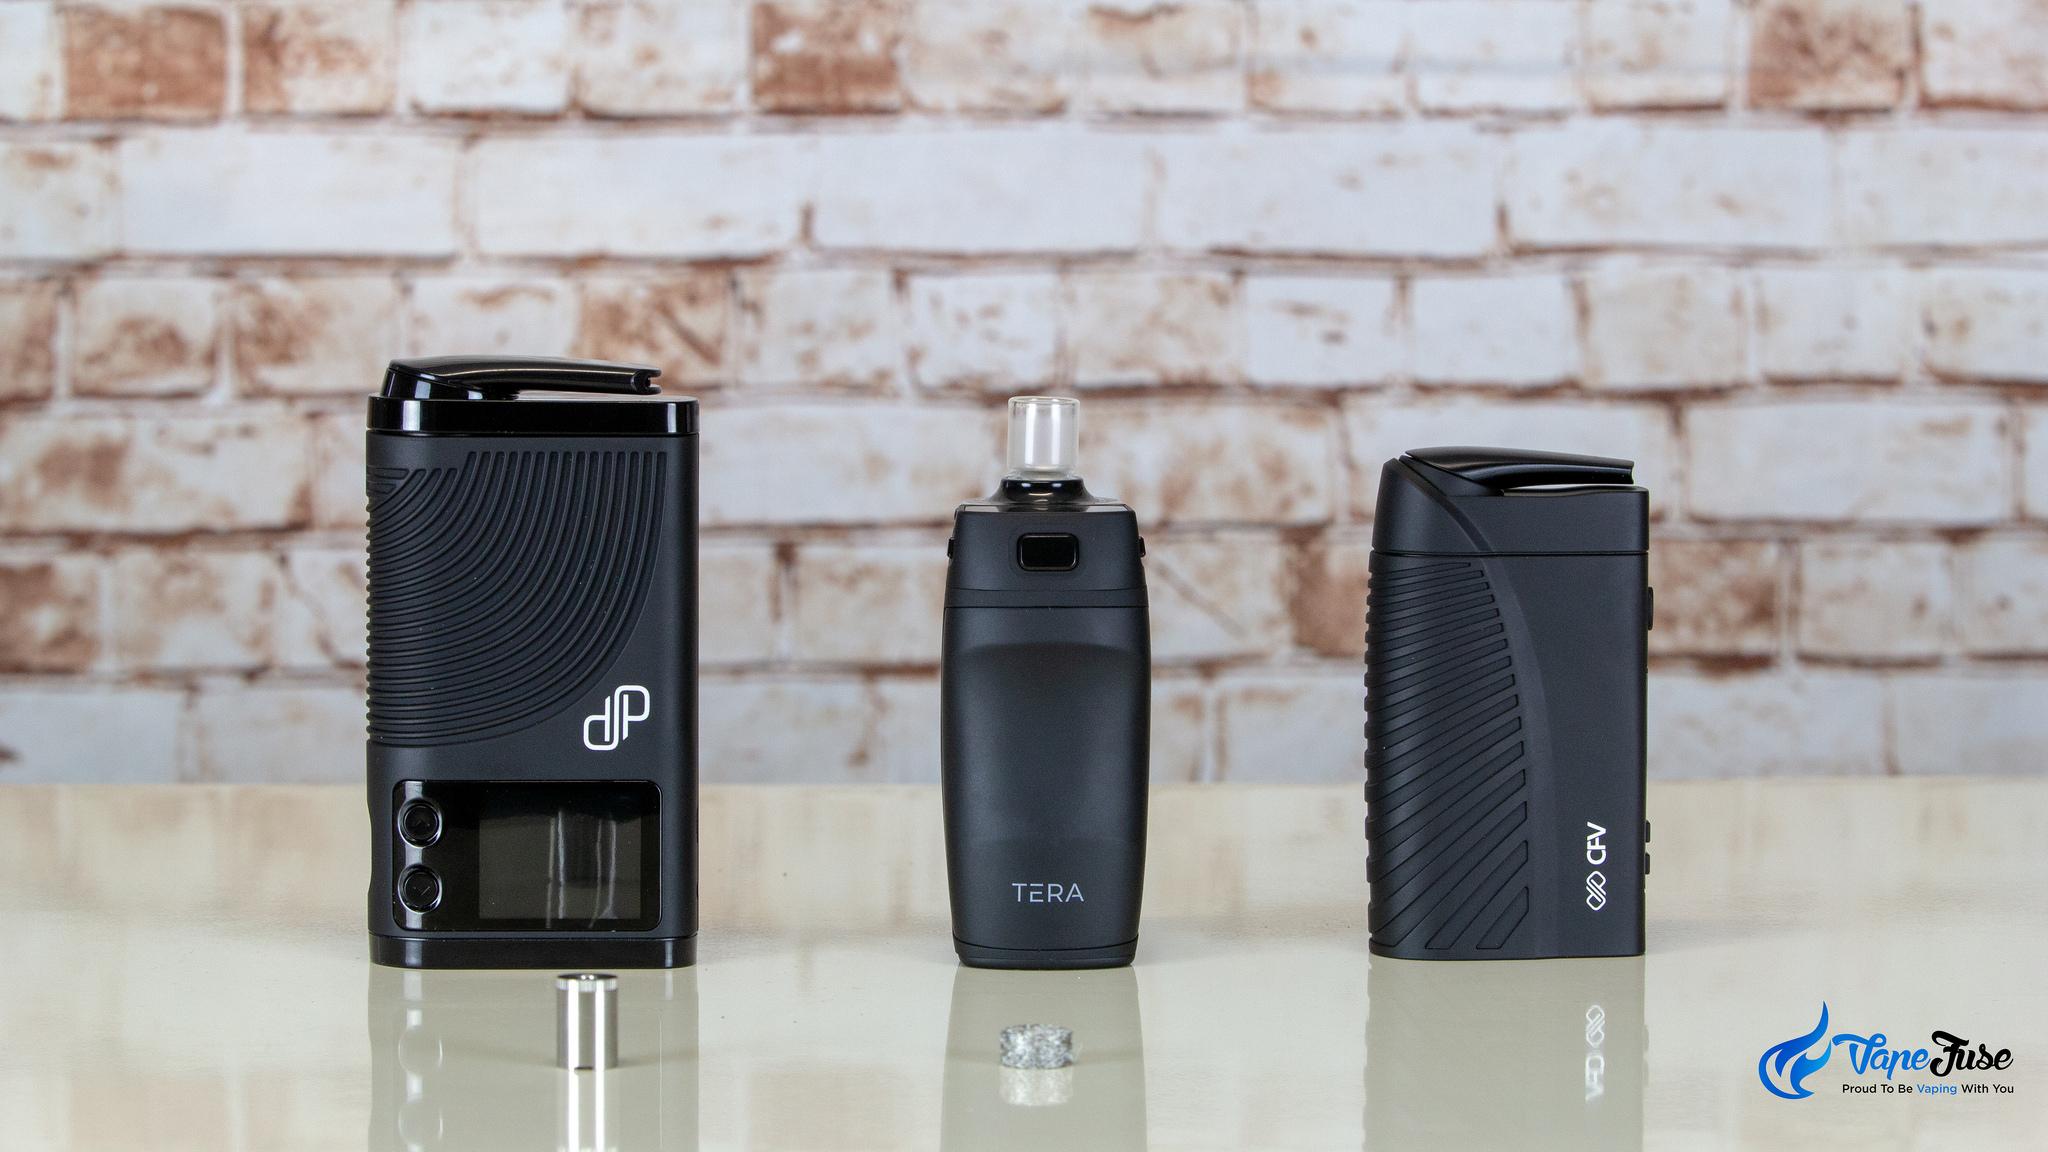 Boundless Technology Portable Vapes: Meet the CFV, CFX & Tera